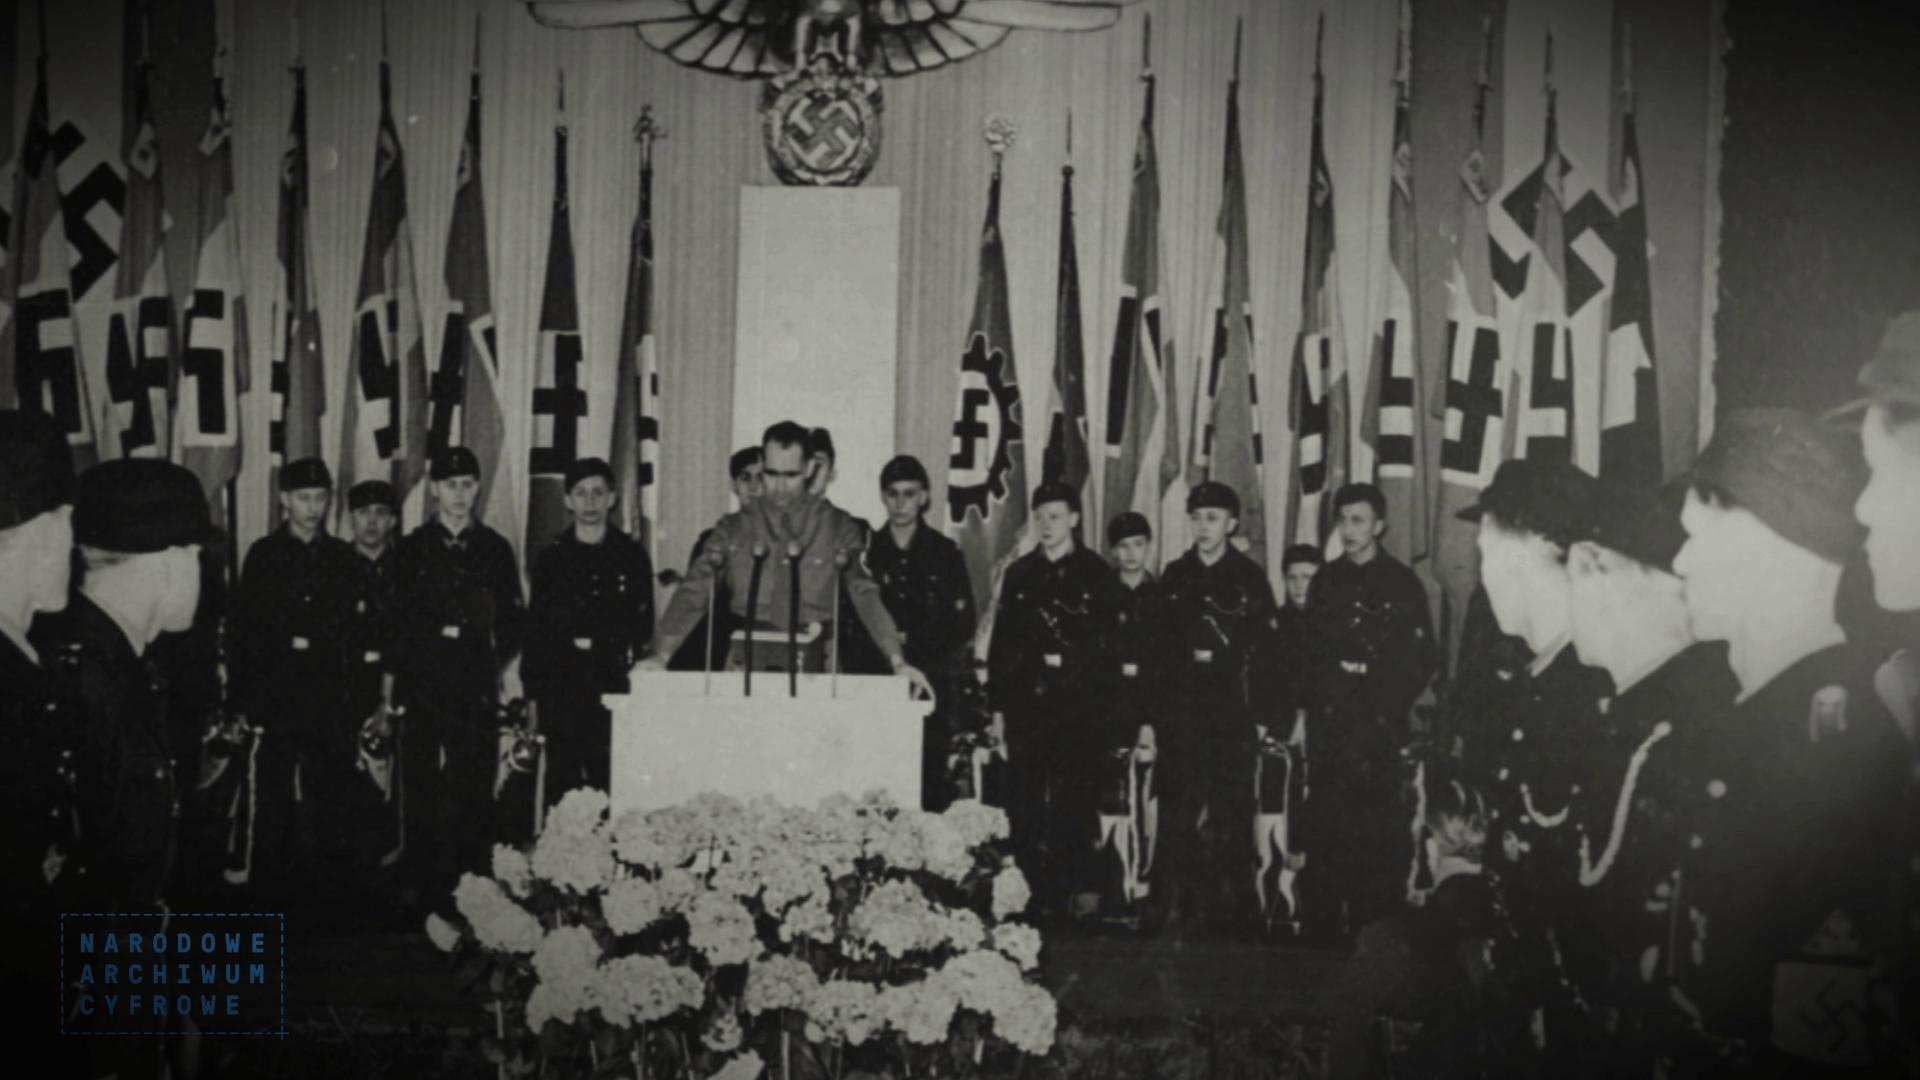 Rudolf Hess kult zbrodnia na Narożniku